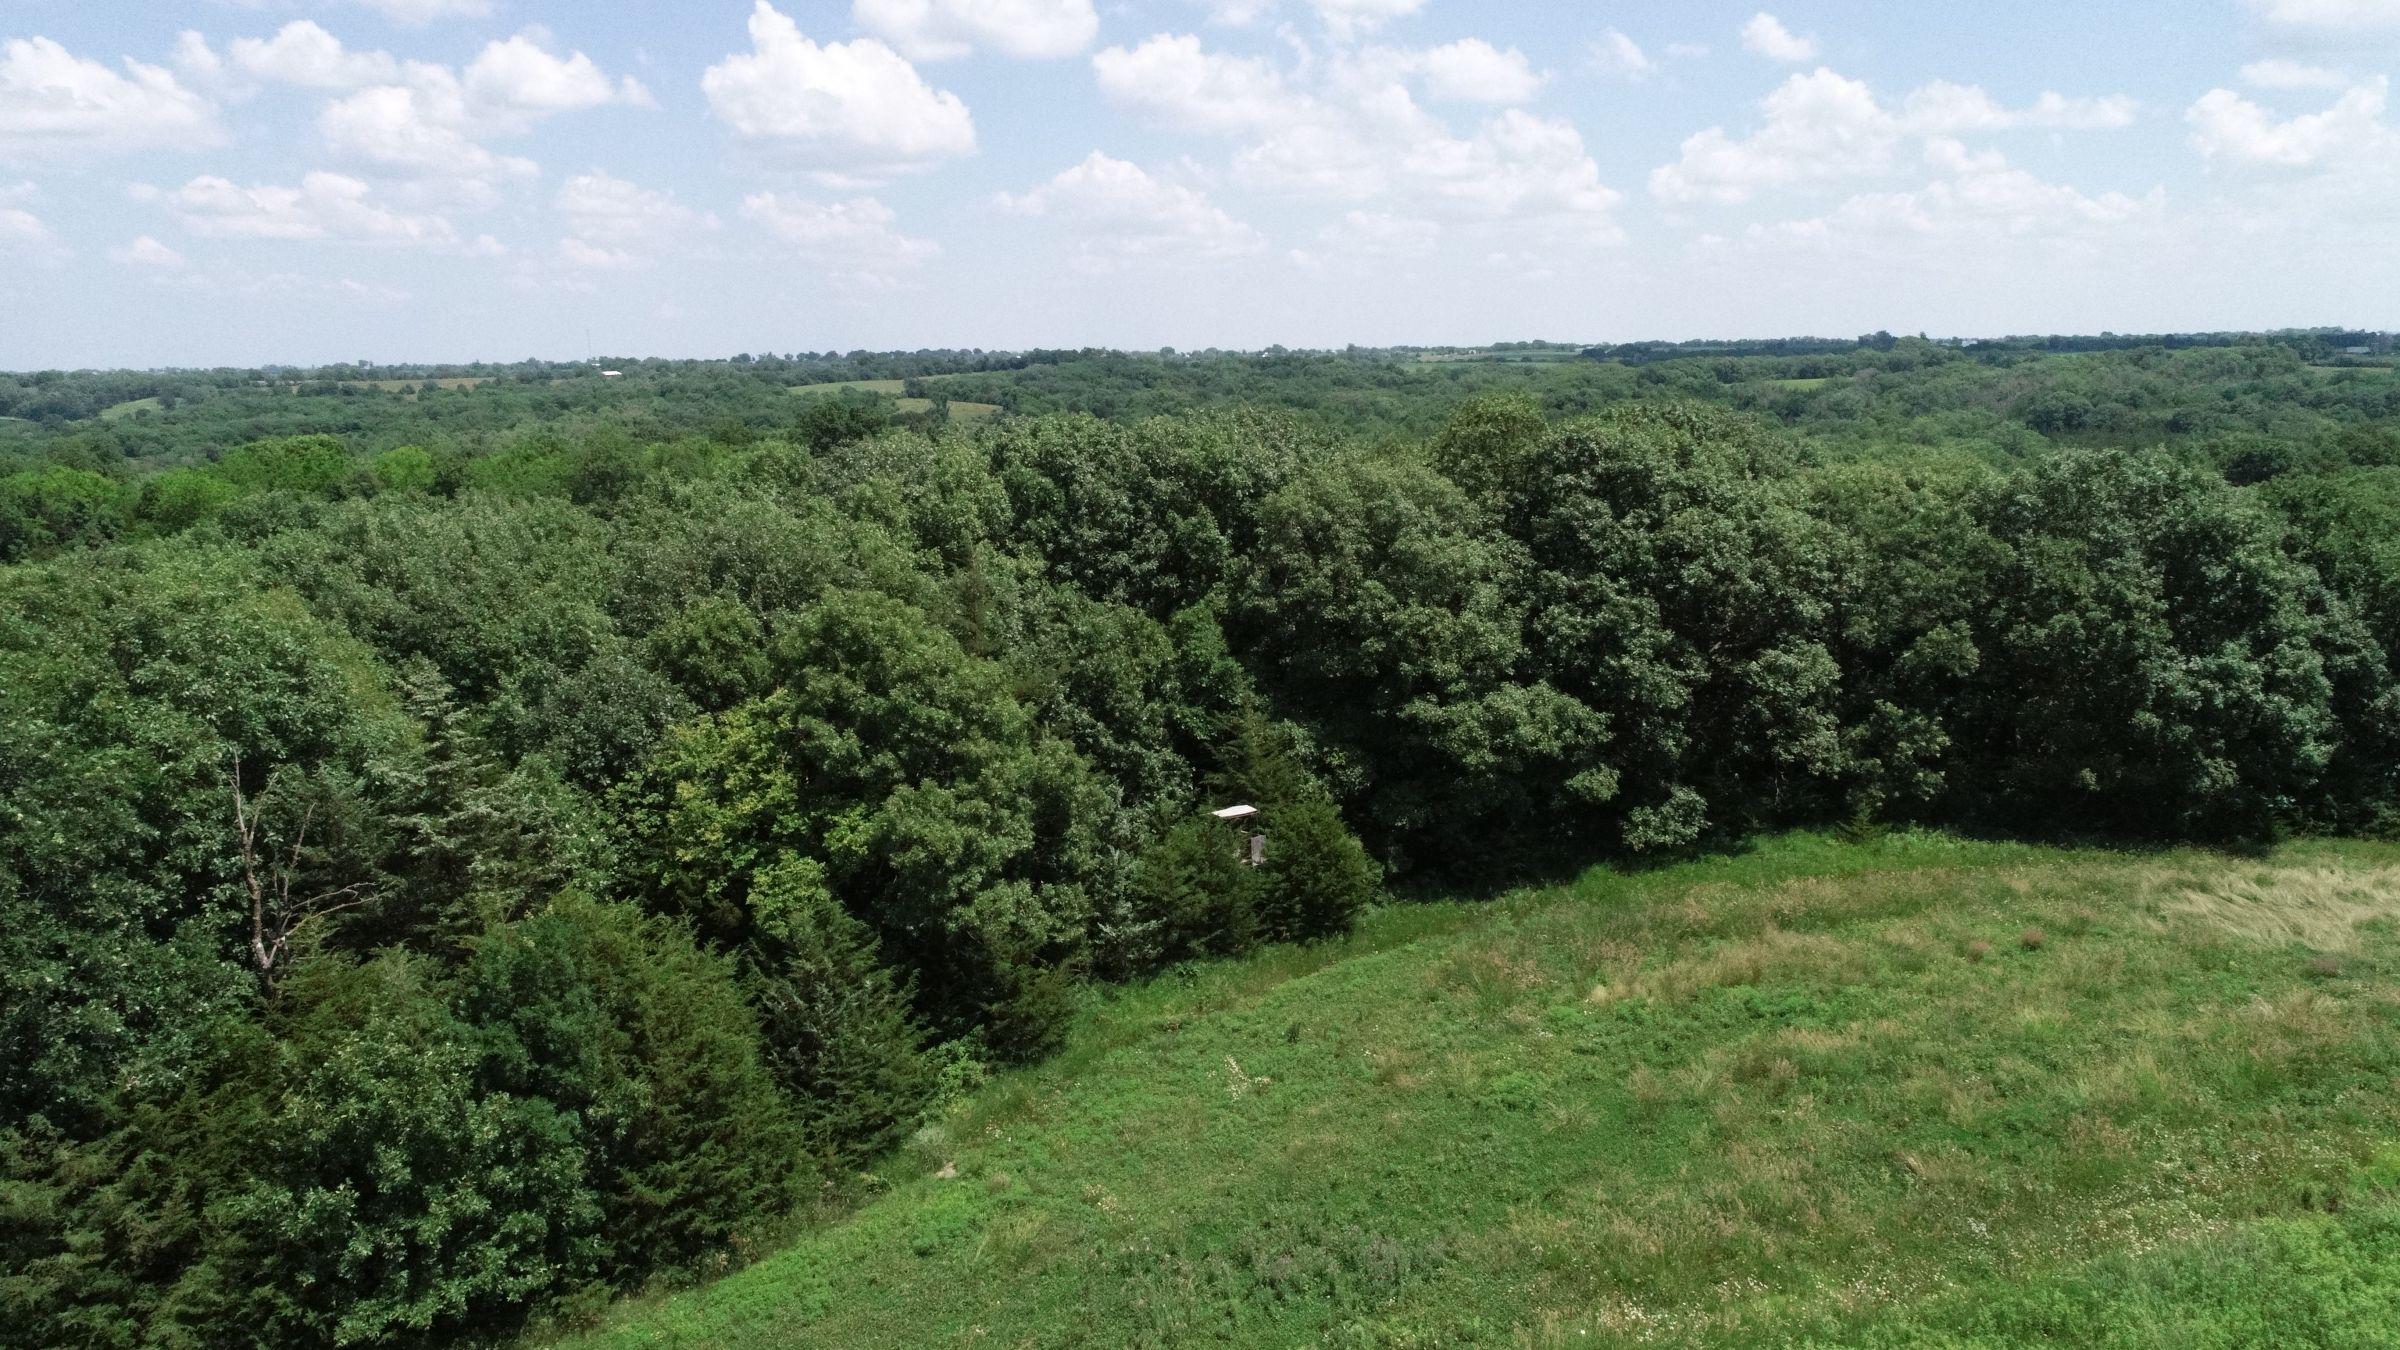 land-warren-county-iowa-29-acres-listing-number-15622-2-2021-07-02-190407.JPG